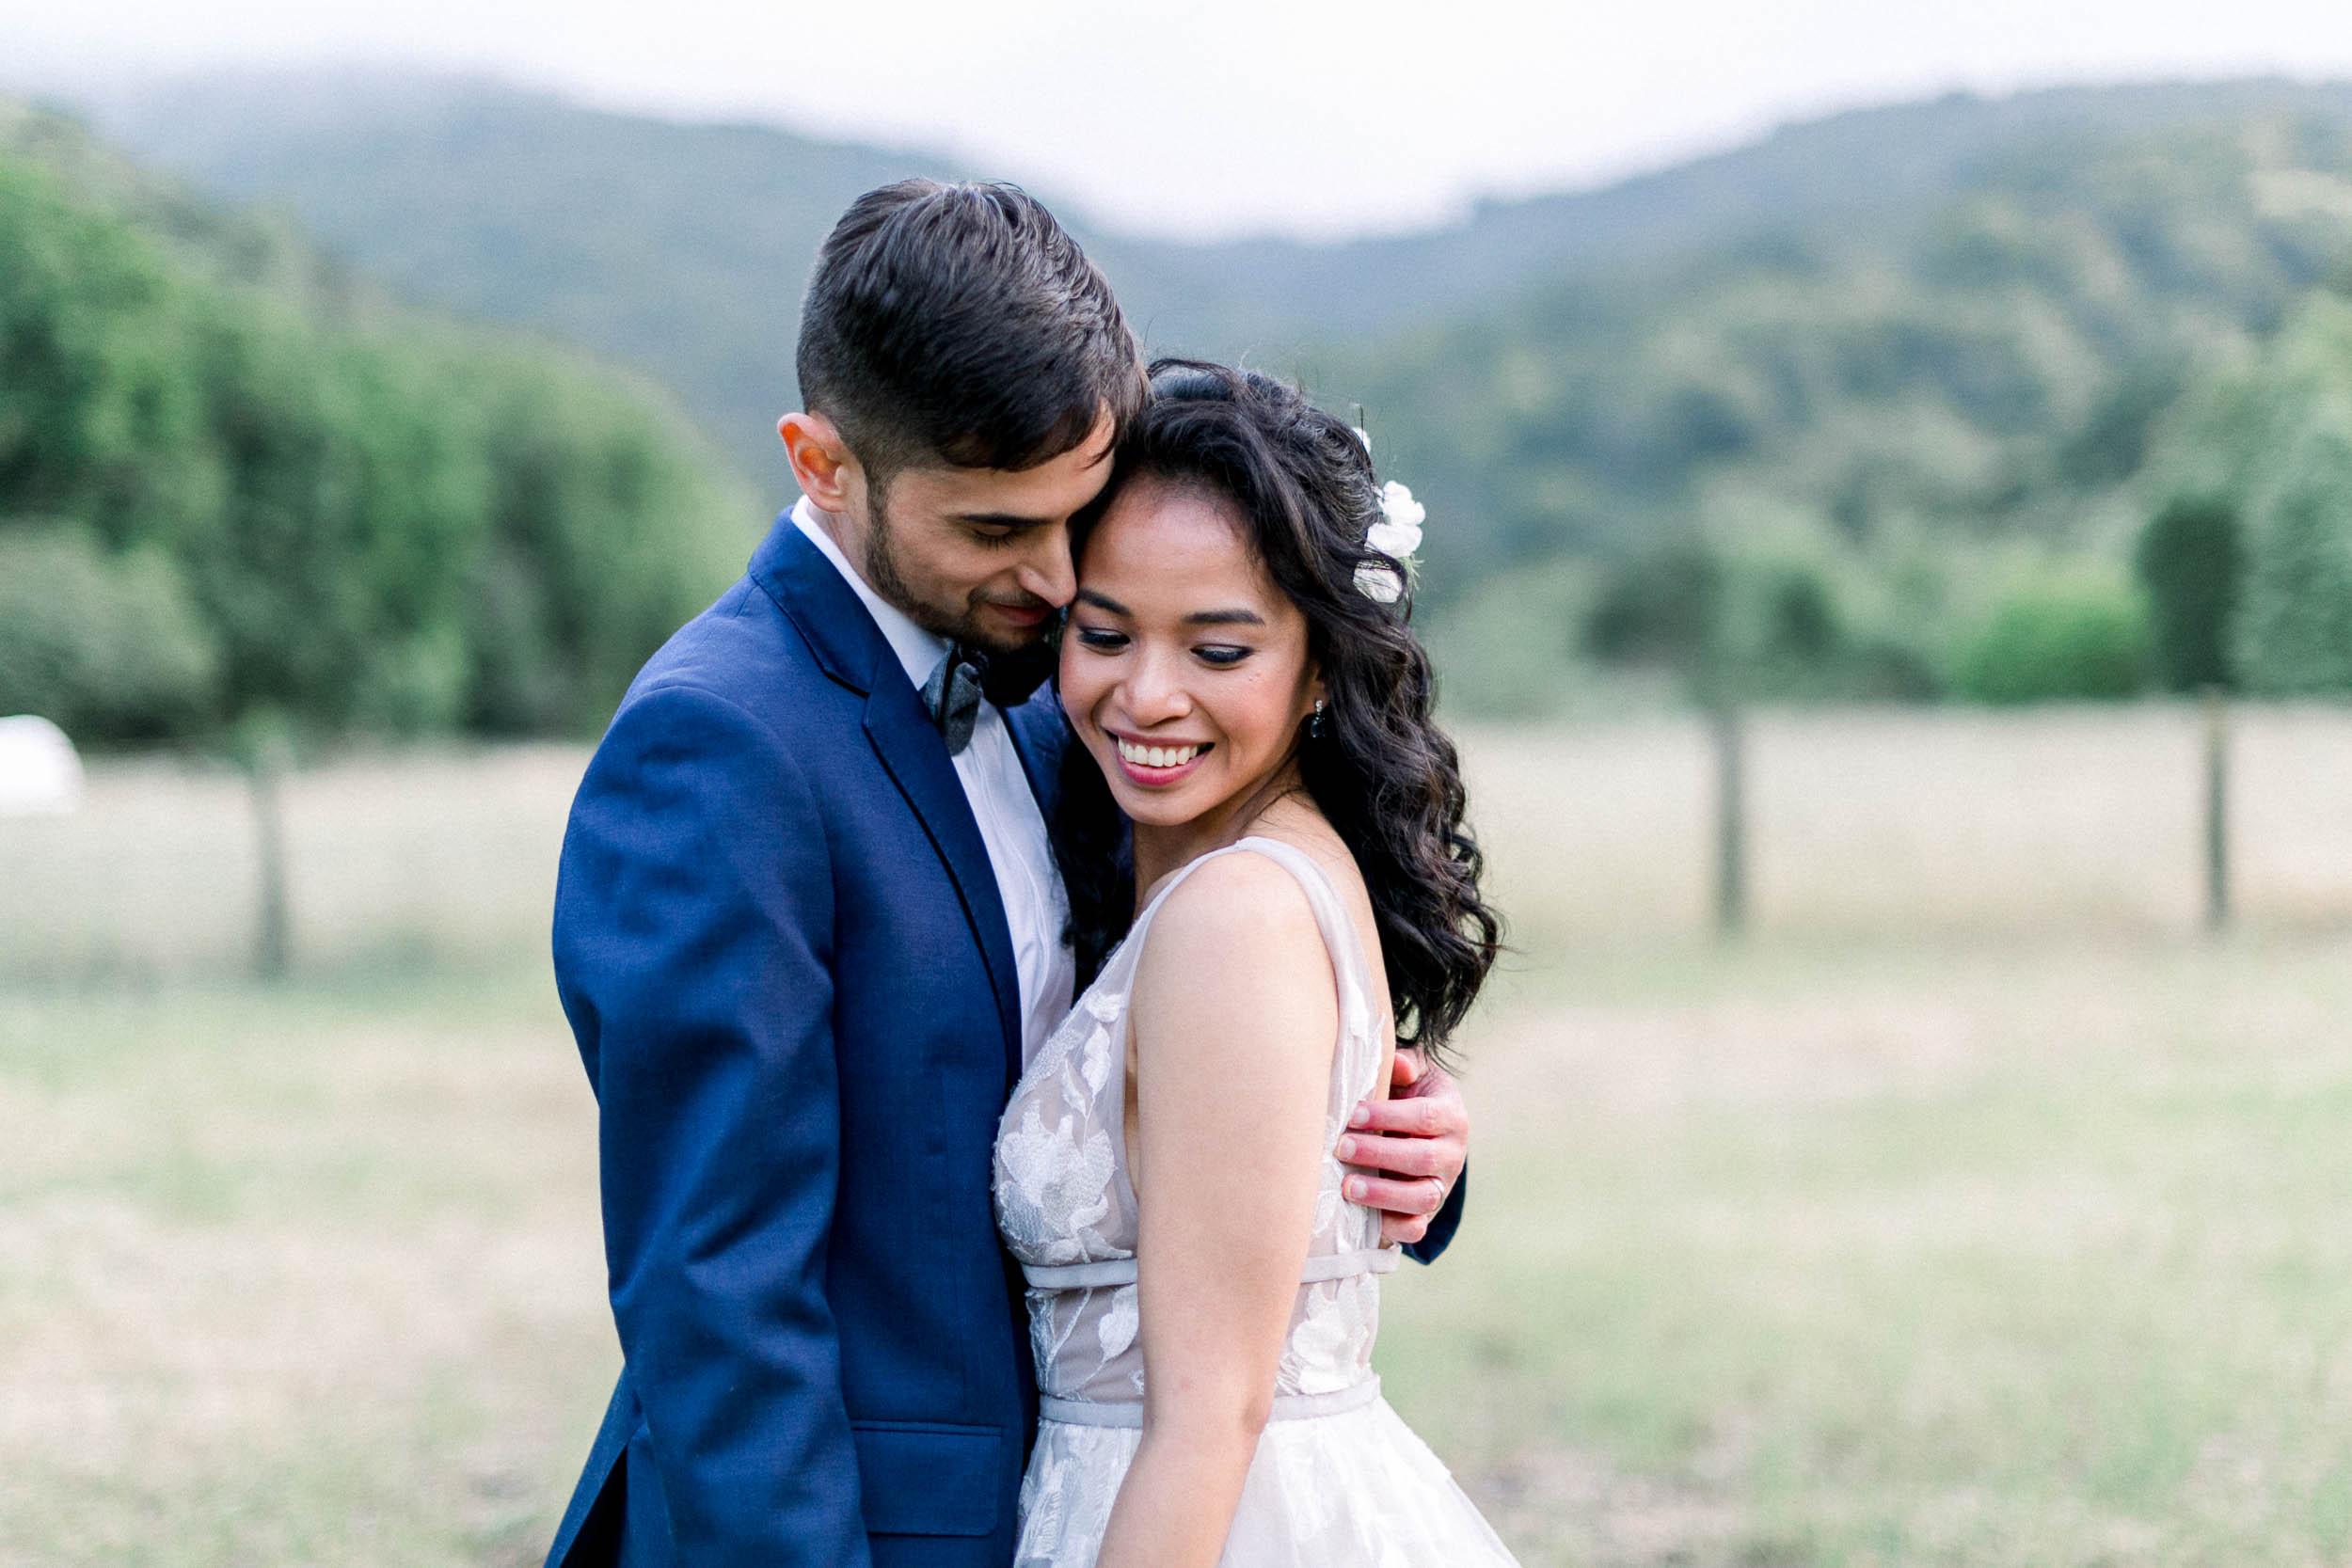 052519_B+S_Hidden Villa Wedding_Buena Lane Photography_052519_1067CY.jpg